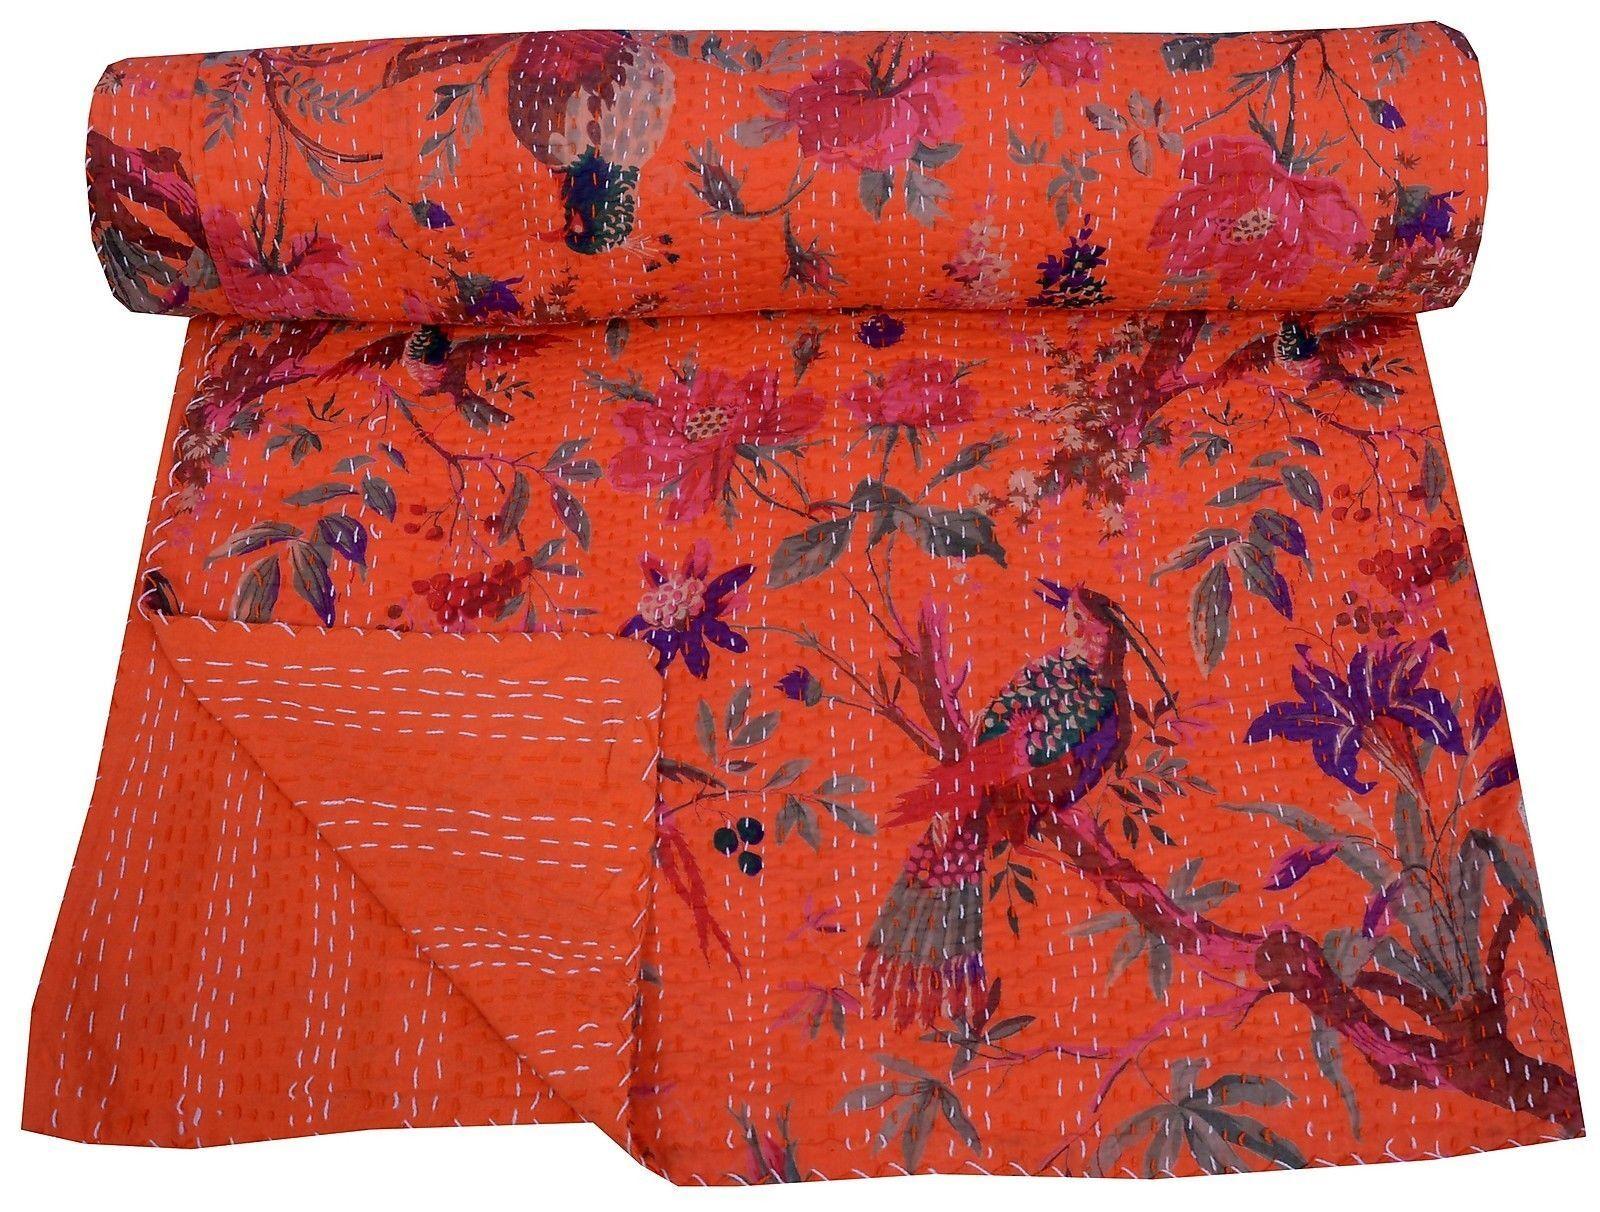 Sari Indian Kantha Bedspread Rallies Blanket Queen Size Bird Print Kantha Quilt